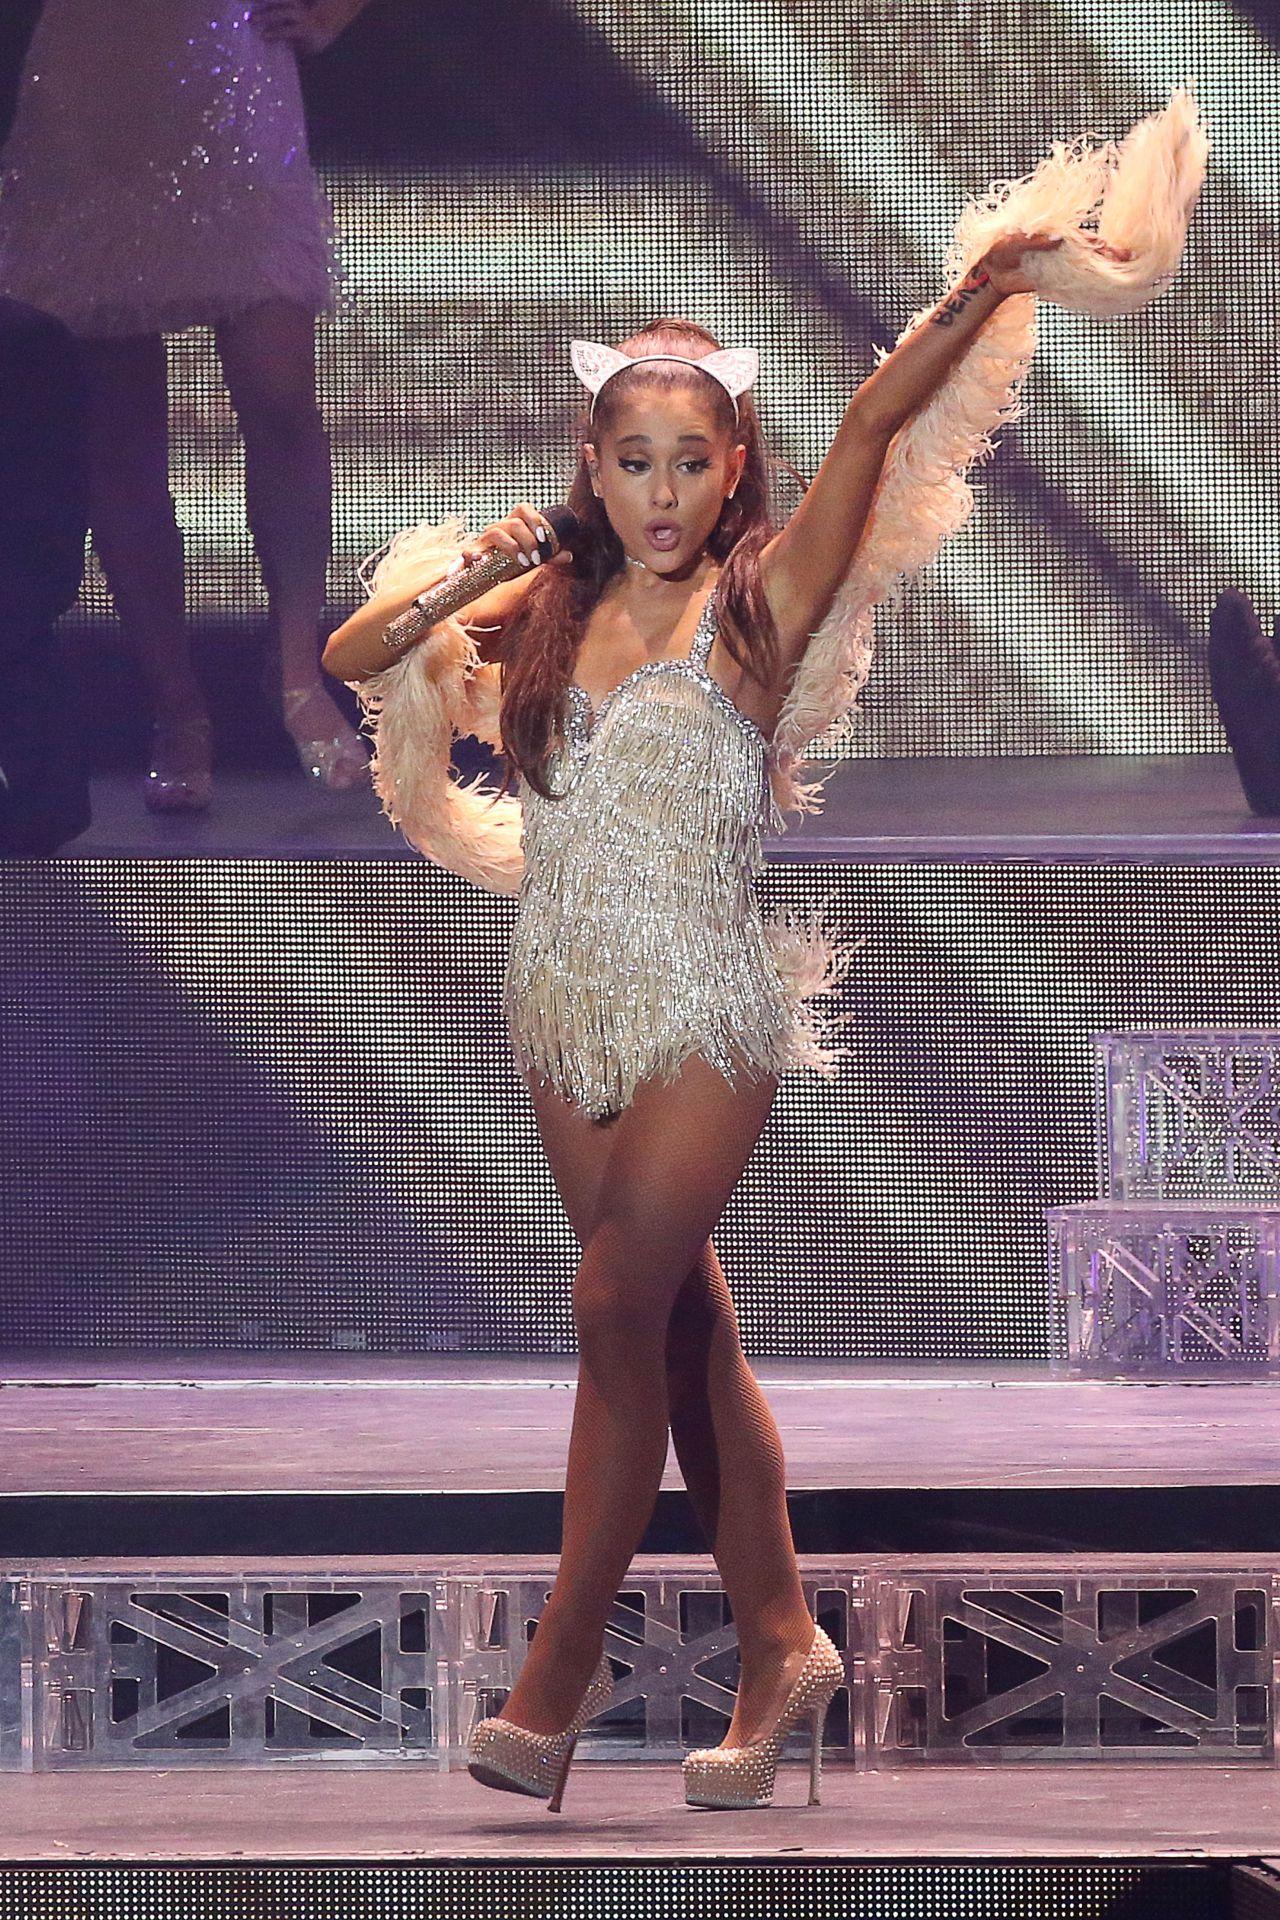 Ariana Grande The Honeymoon Tour In Milan May 2015